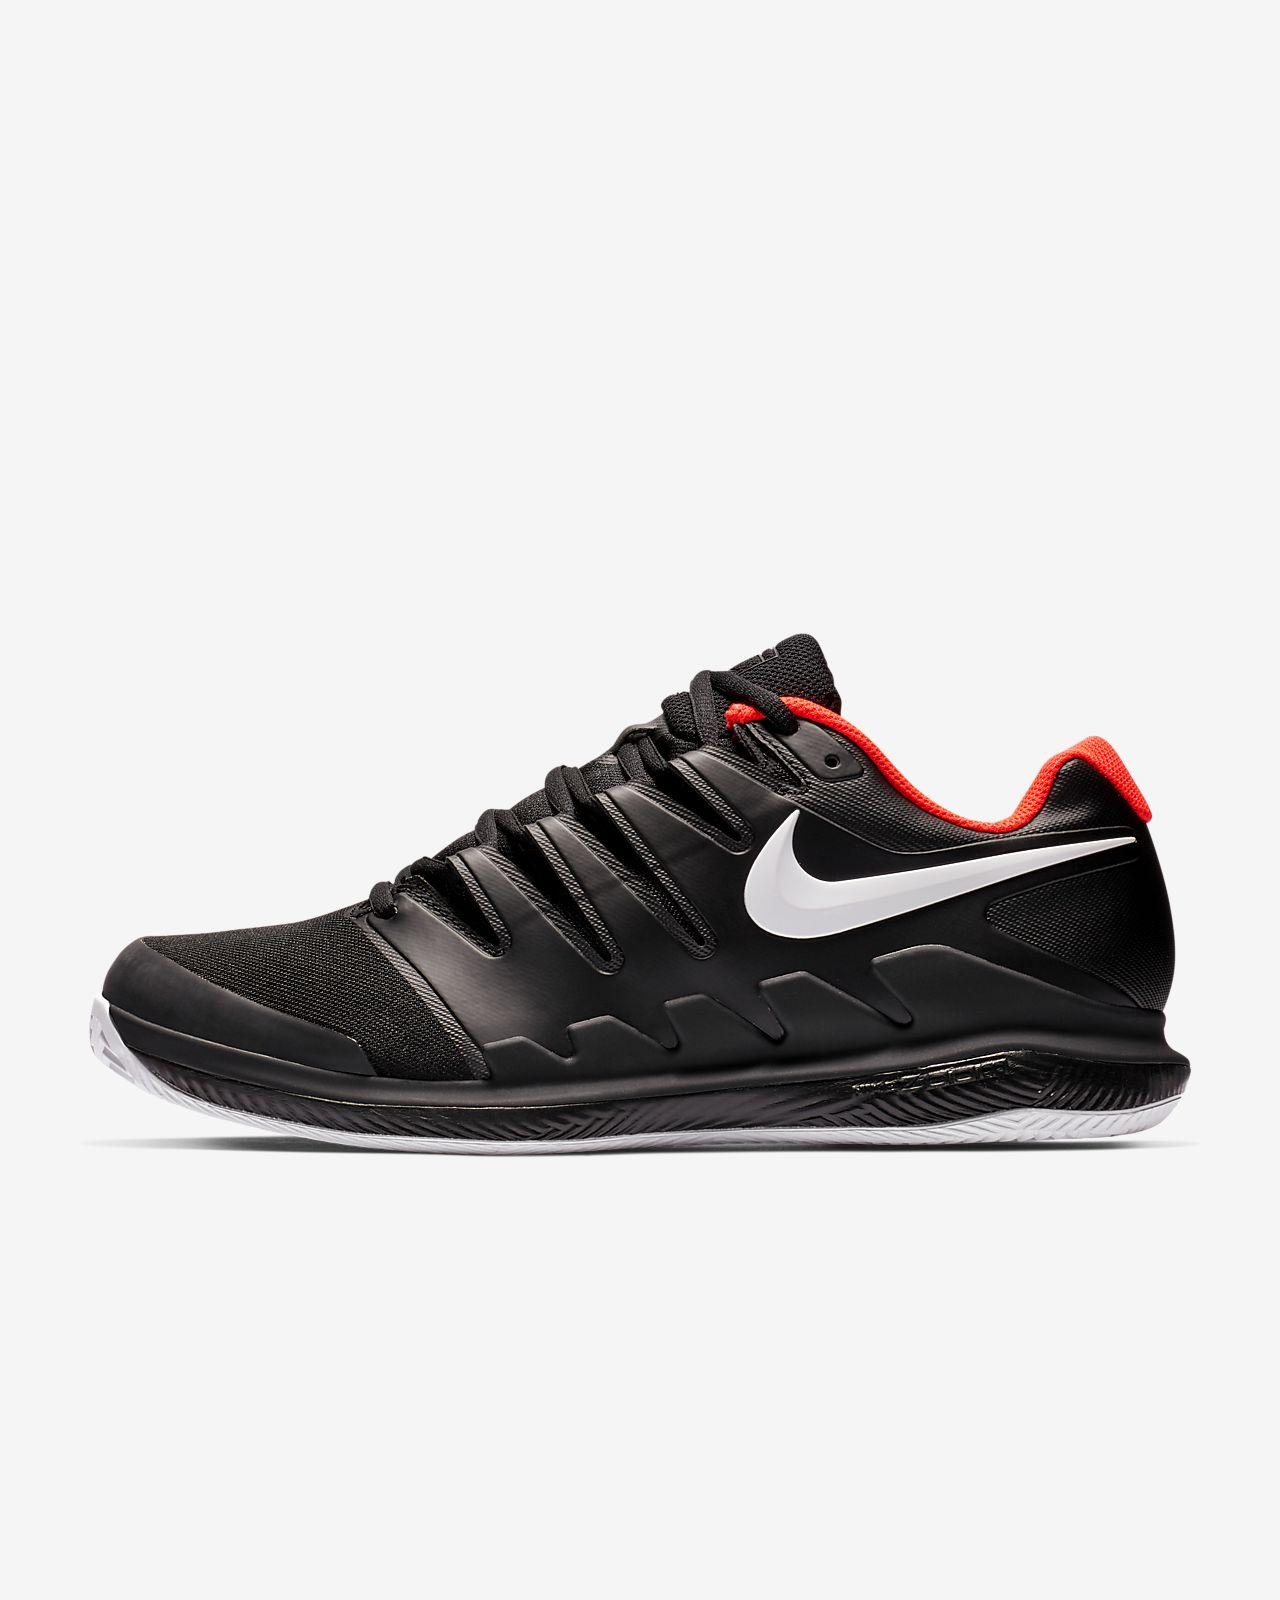 new concept 90320 54515 Nike Air Zoom Vapor X Clay Zapatillas de tenis - Hombre